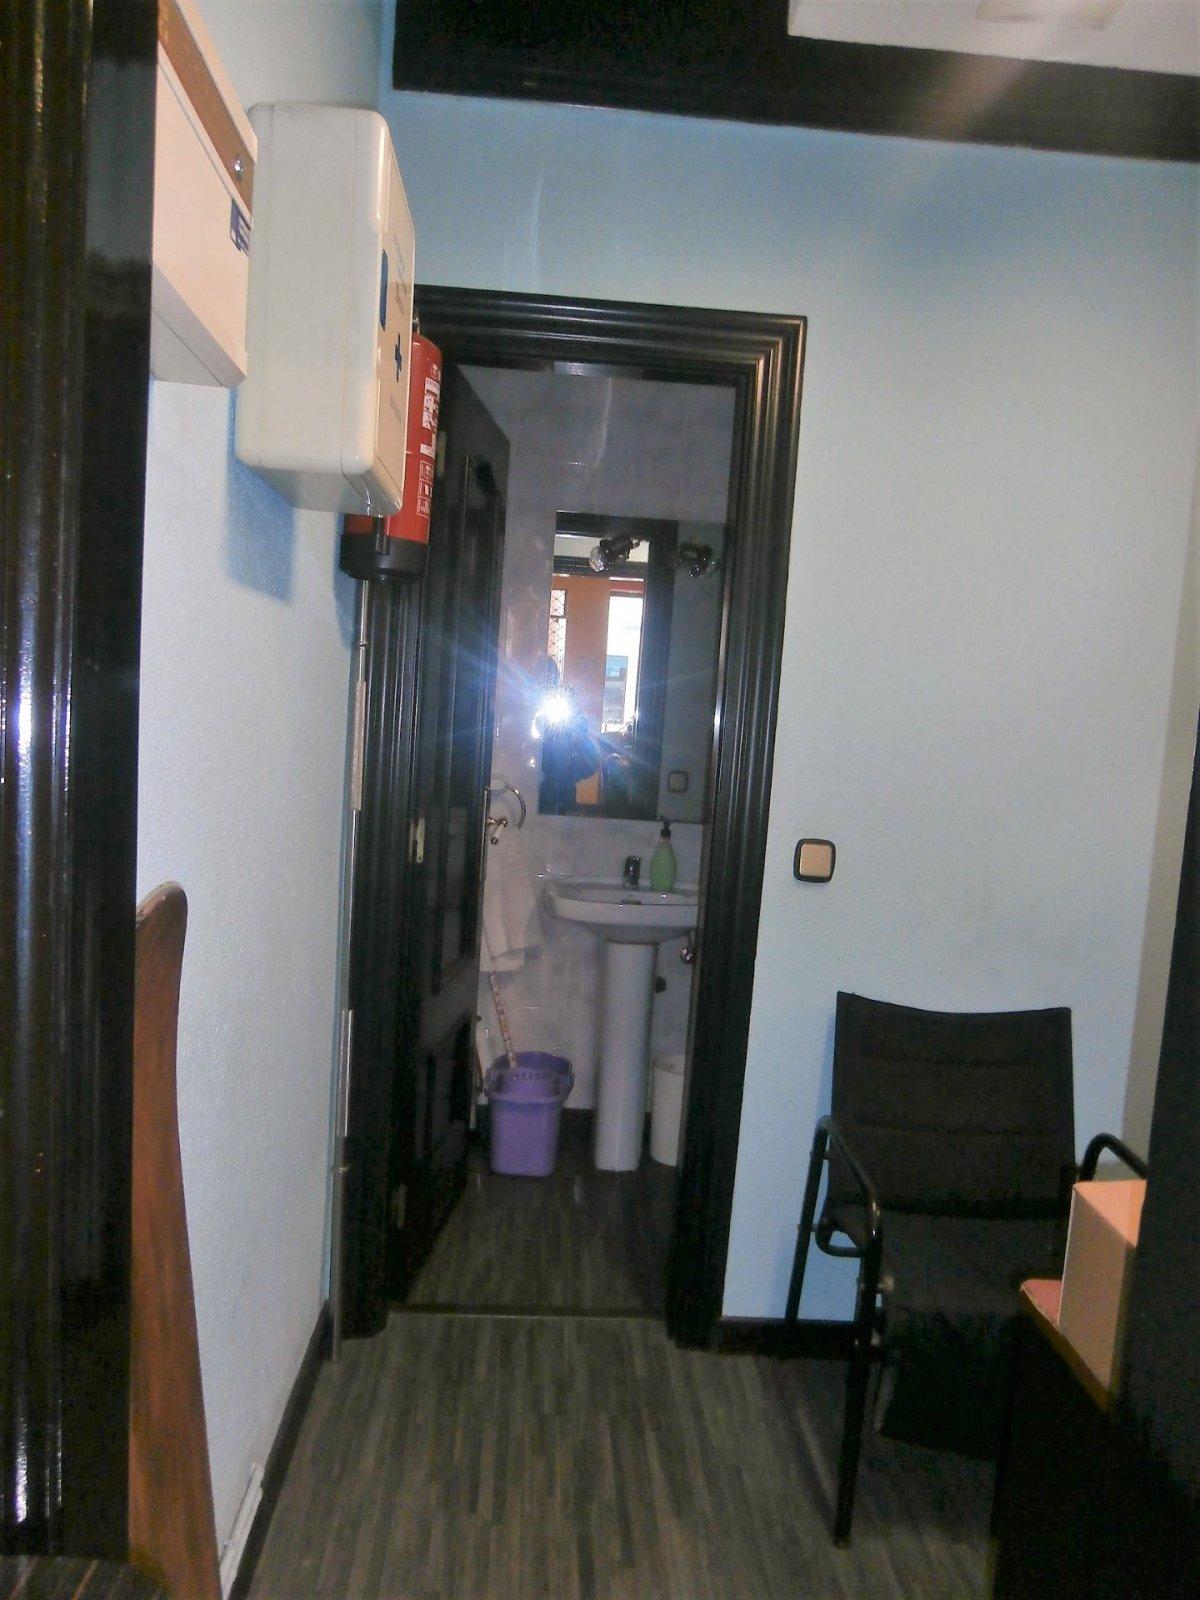 Local instalado como peluqueria - imagenInmueble12